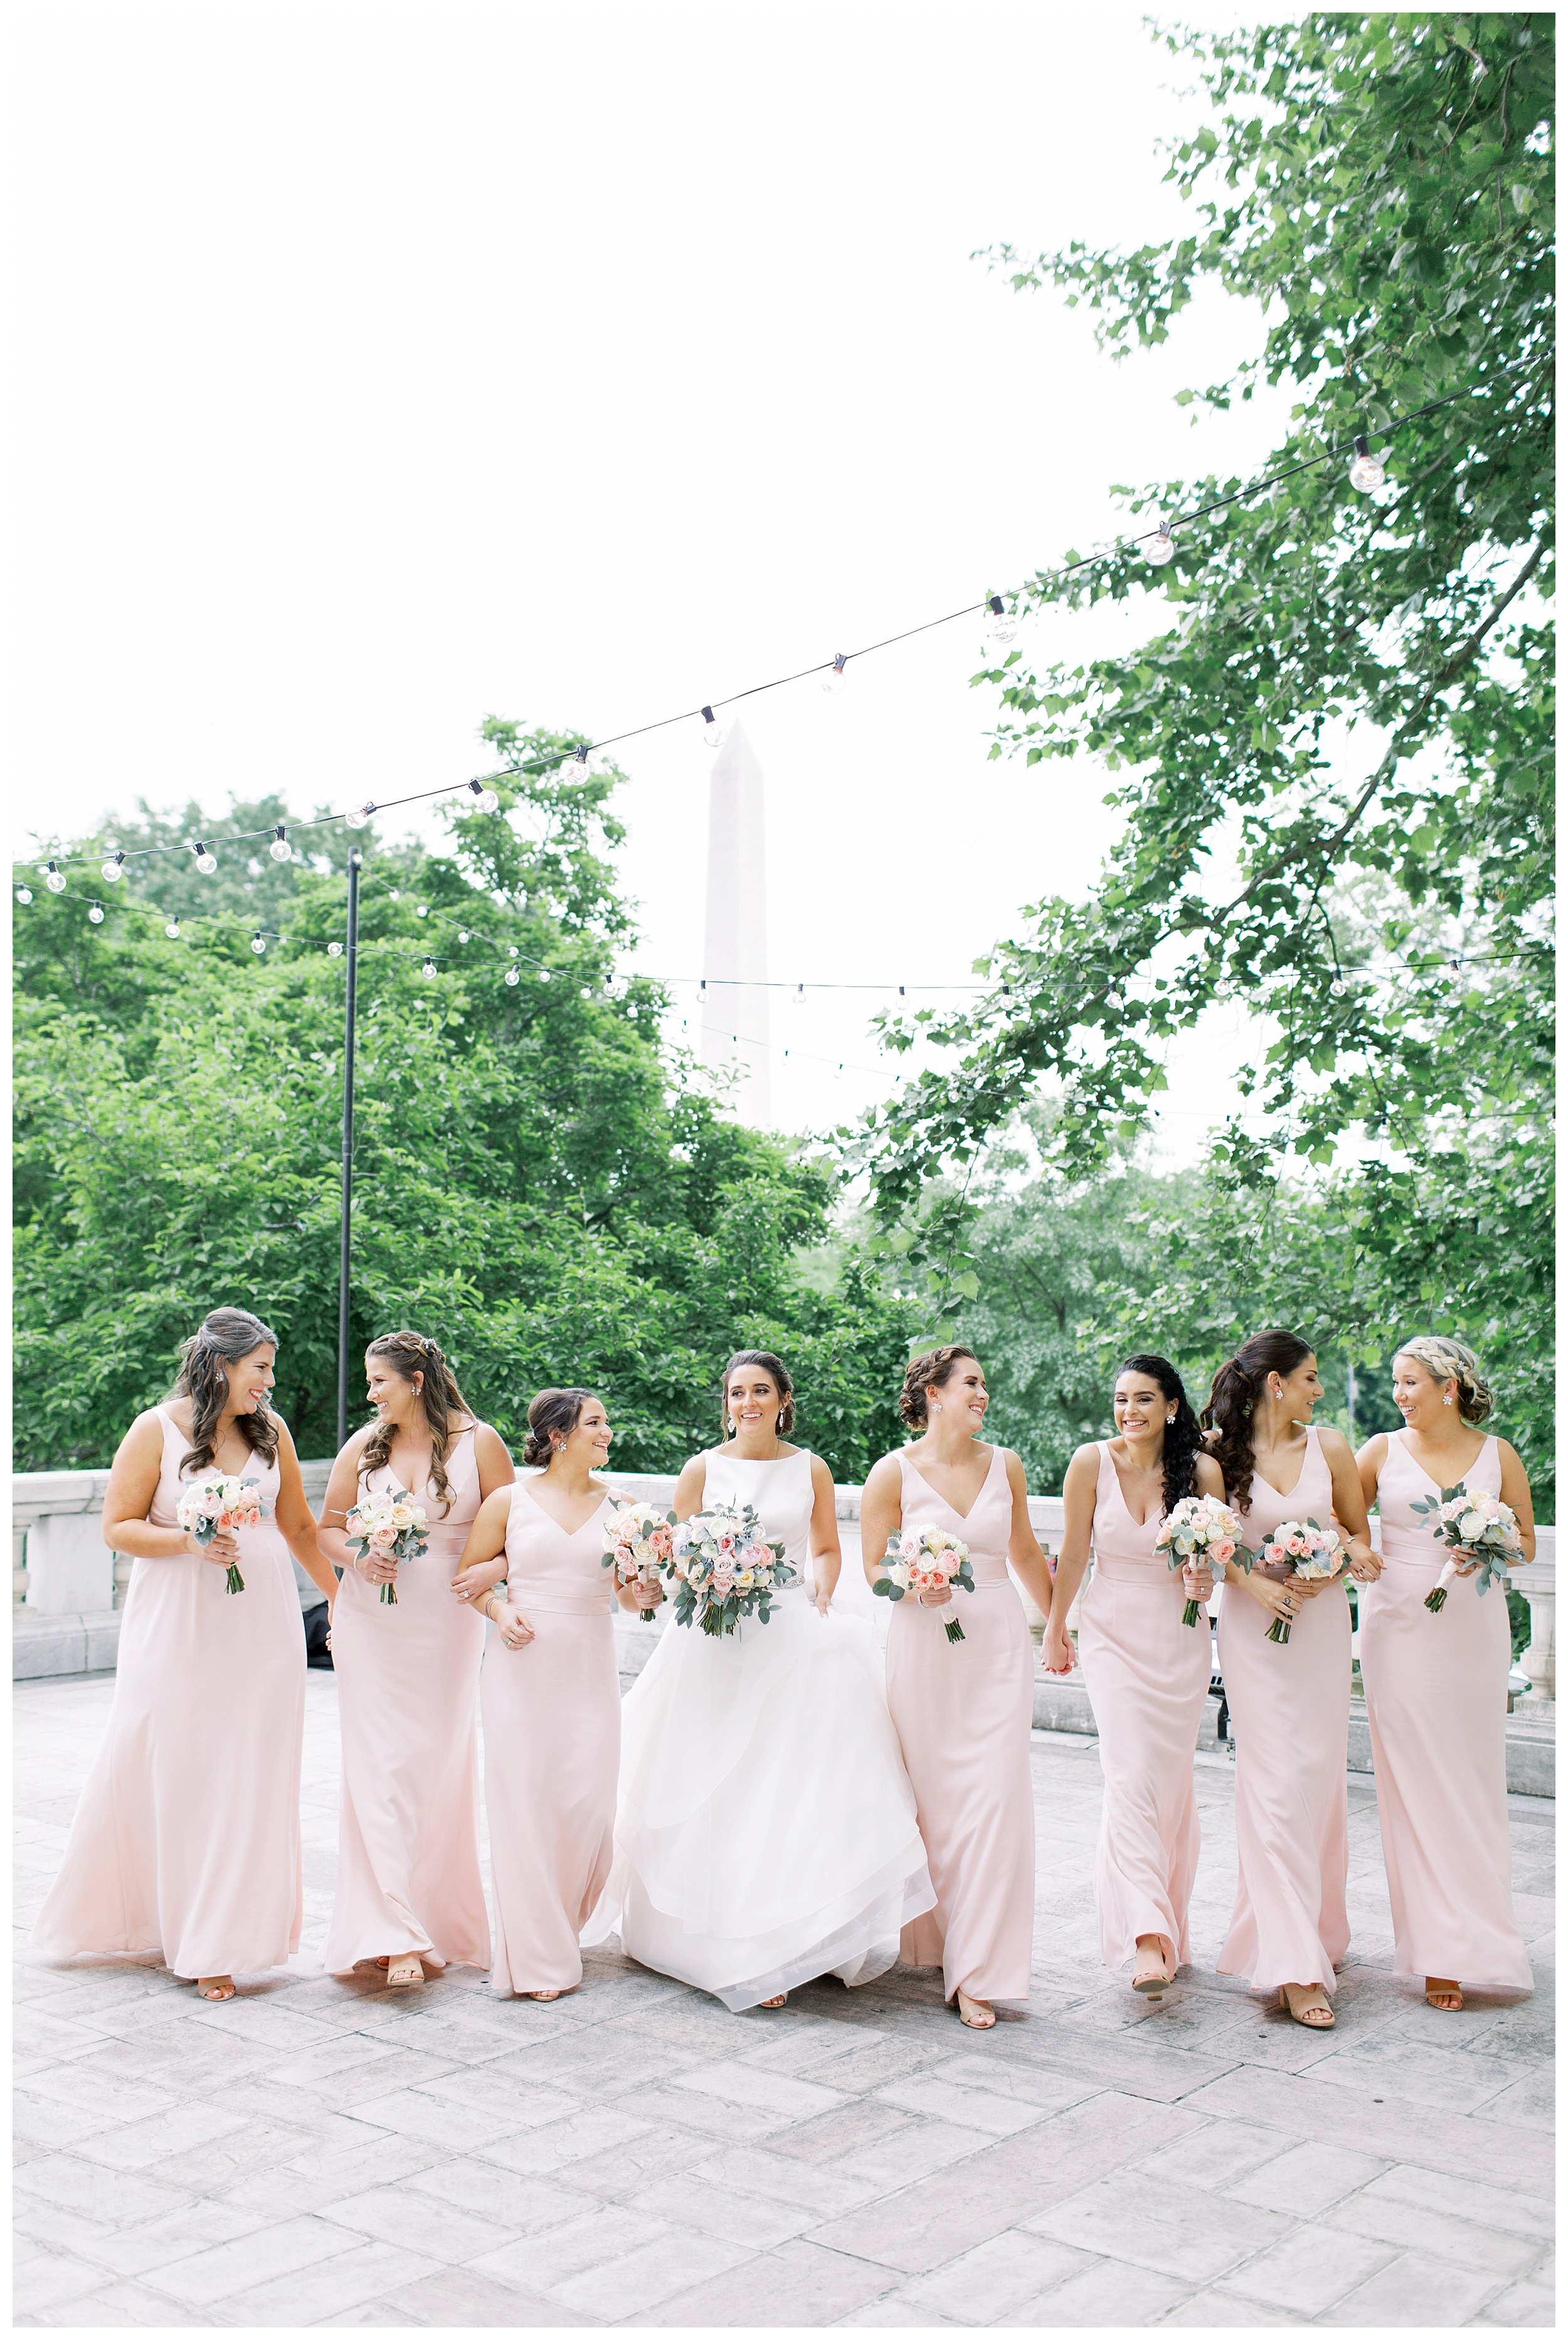 DAR Constitution Hall Wedding Wedding | Daughters of the American Revolution Wedding | District of Columbia Film Wedding Photographer Kir Tuben_0079.jpg